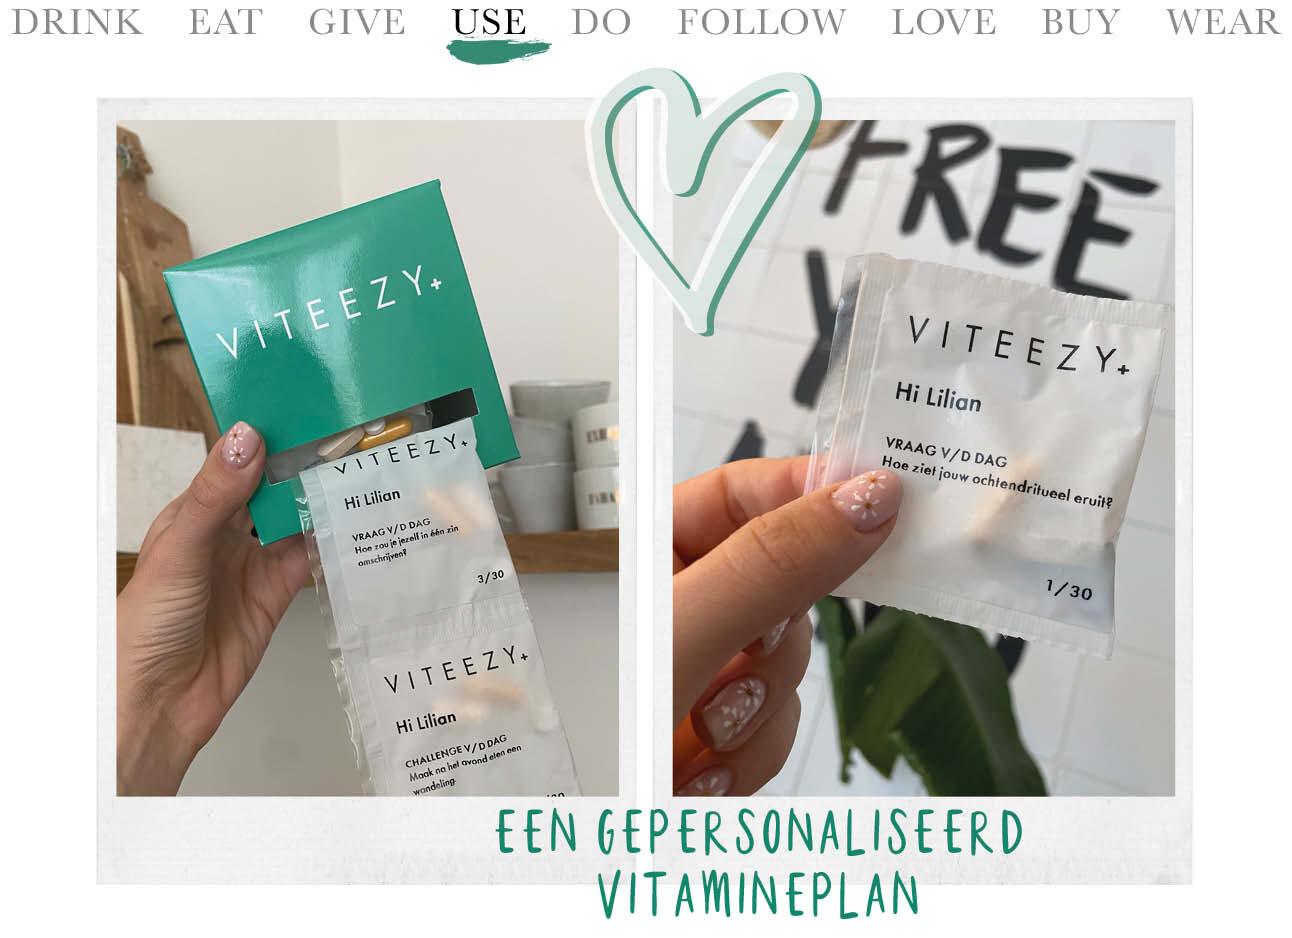 Today we use Viteezy